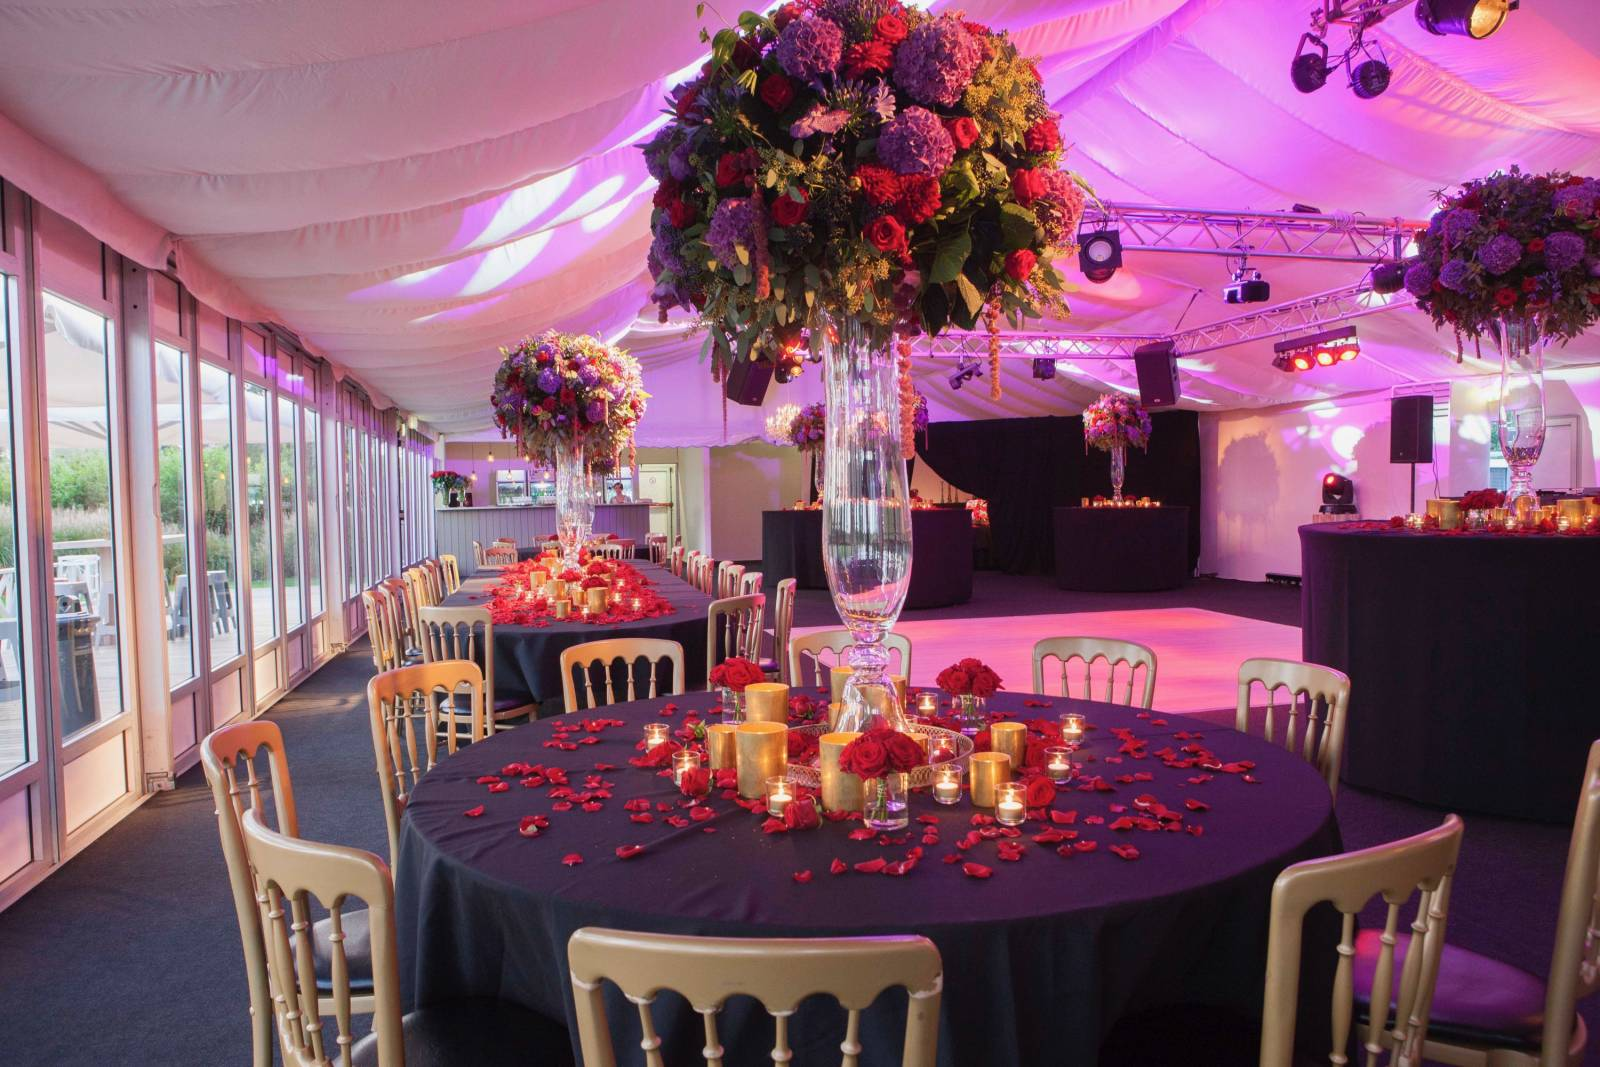 Carpe Diem Bloemen & Decoratie - House of Weddings  - 51